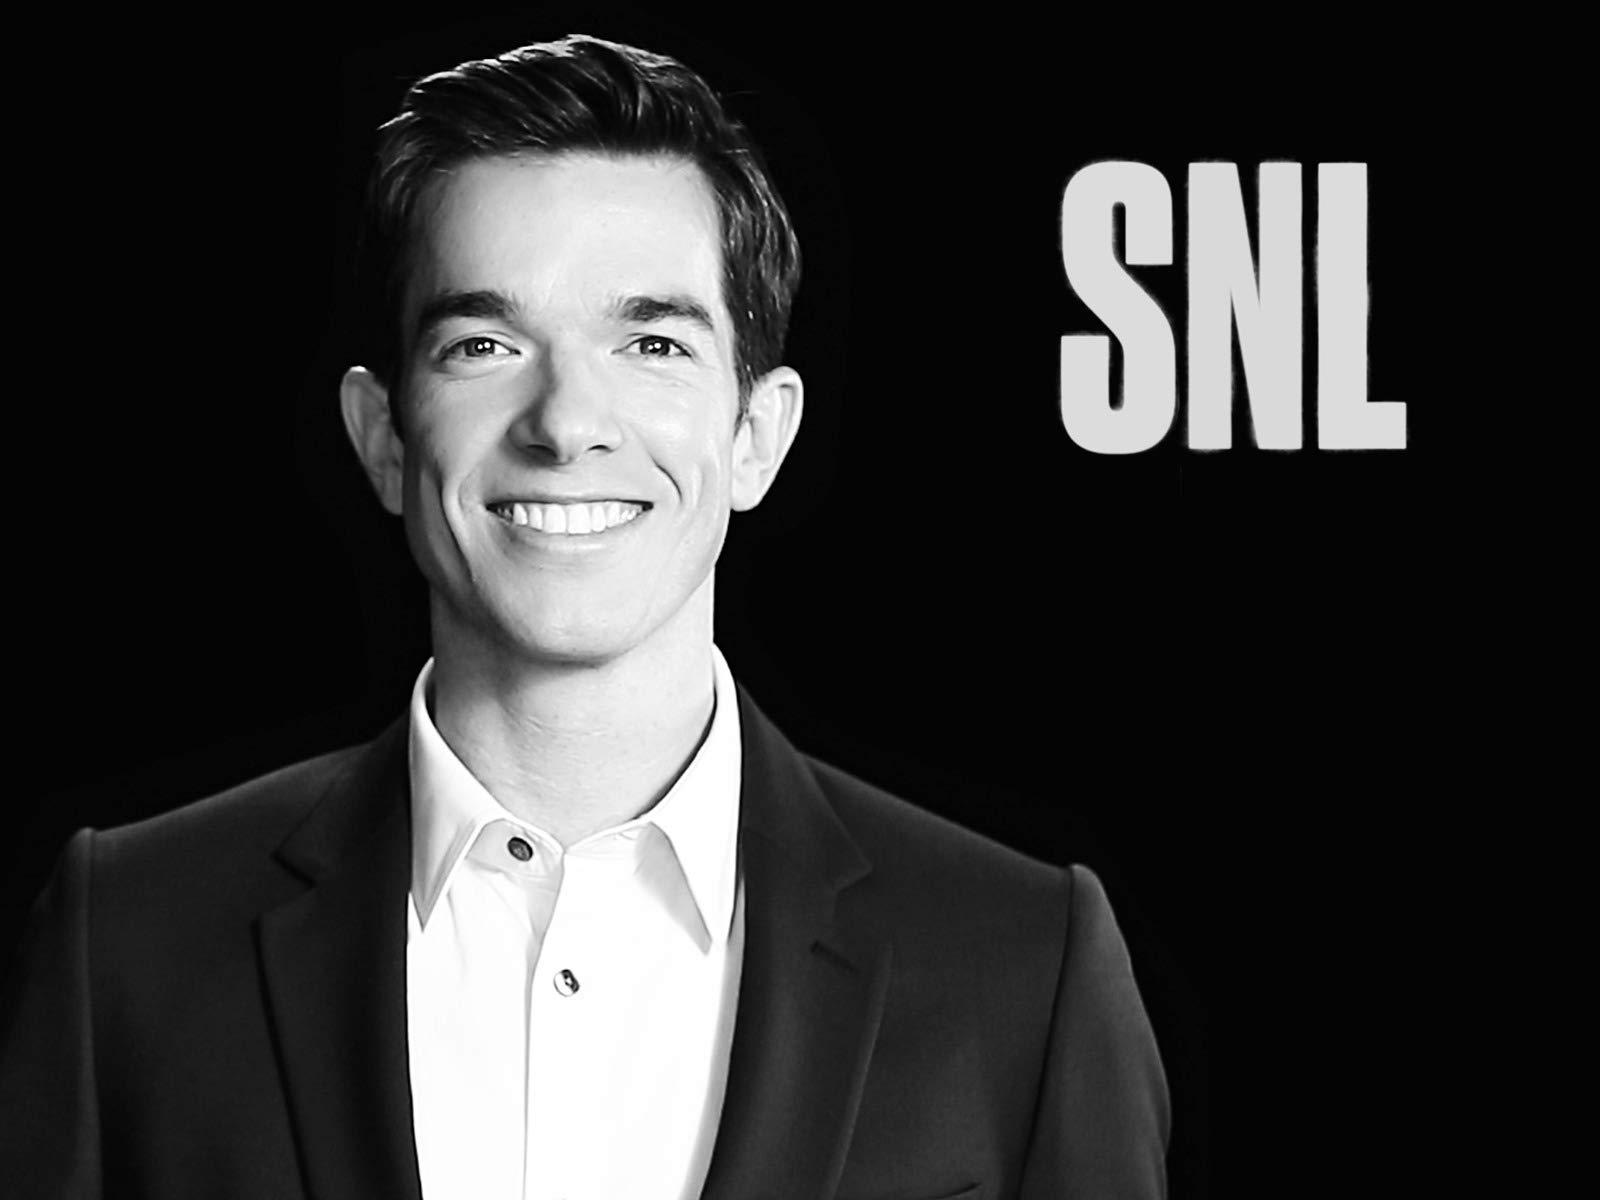 snl season 33 episode 5